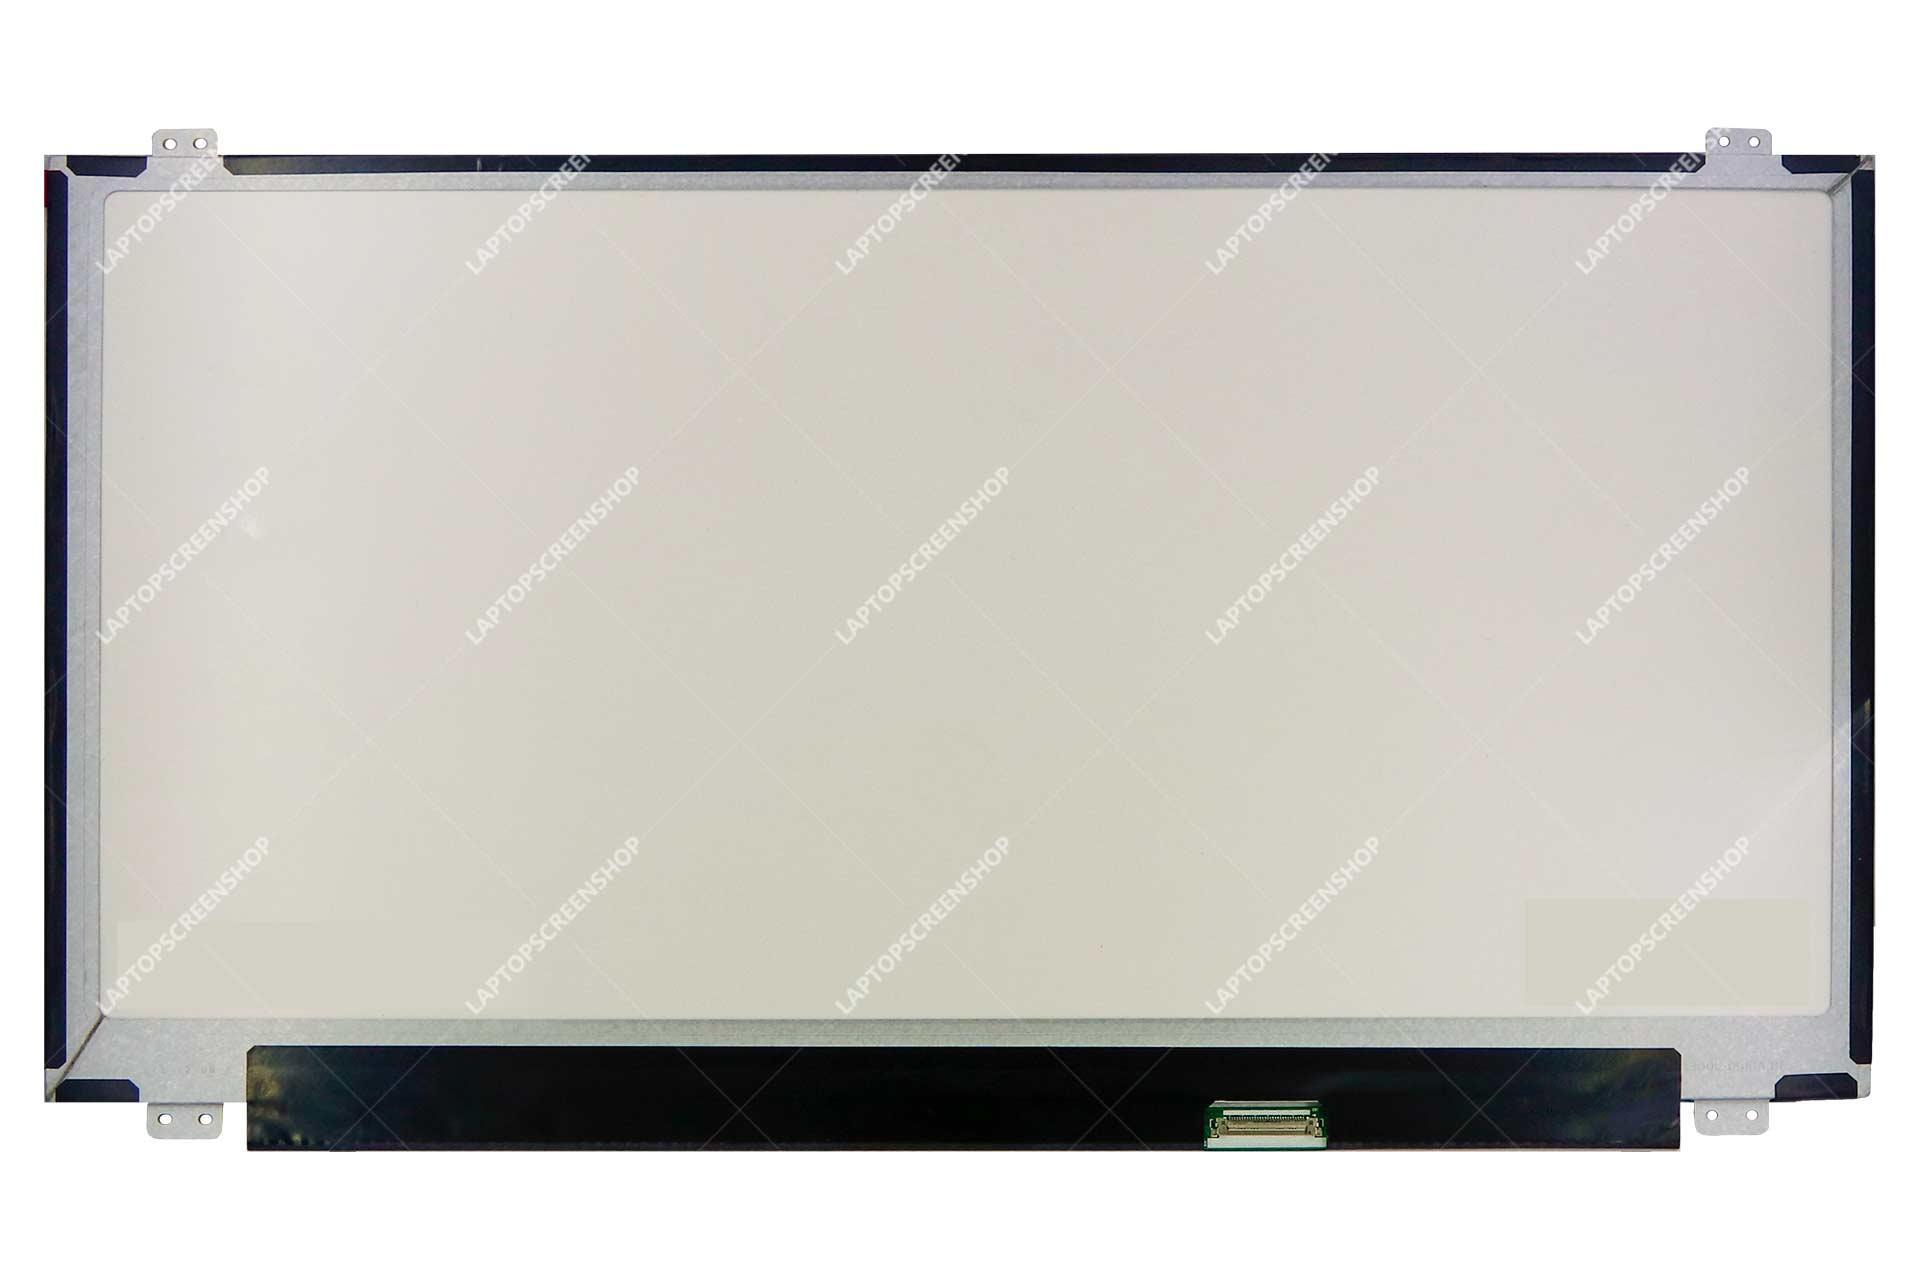 ACER-ASPIRE-E1-570G-6407-LCD  HD فروشگاه لپ تاپ اسکرين   تعمير لپ تاپ